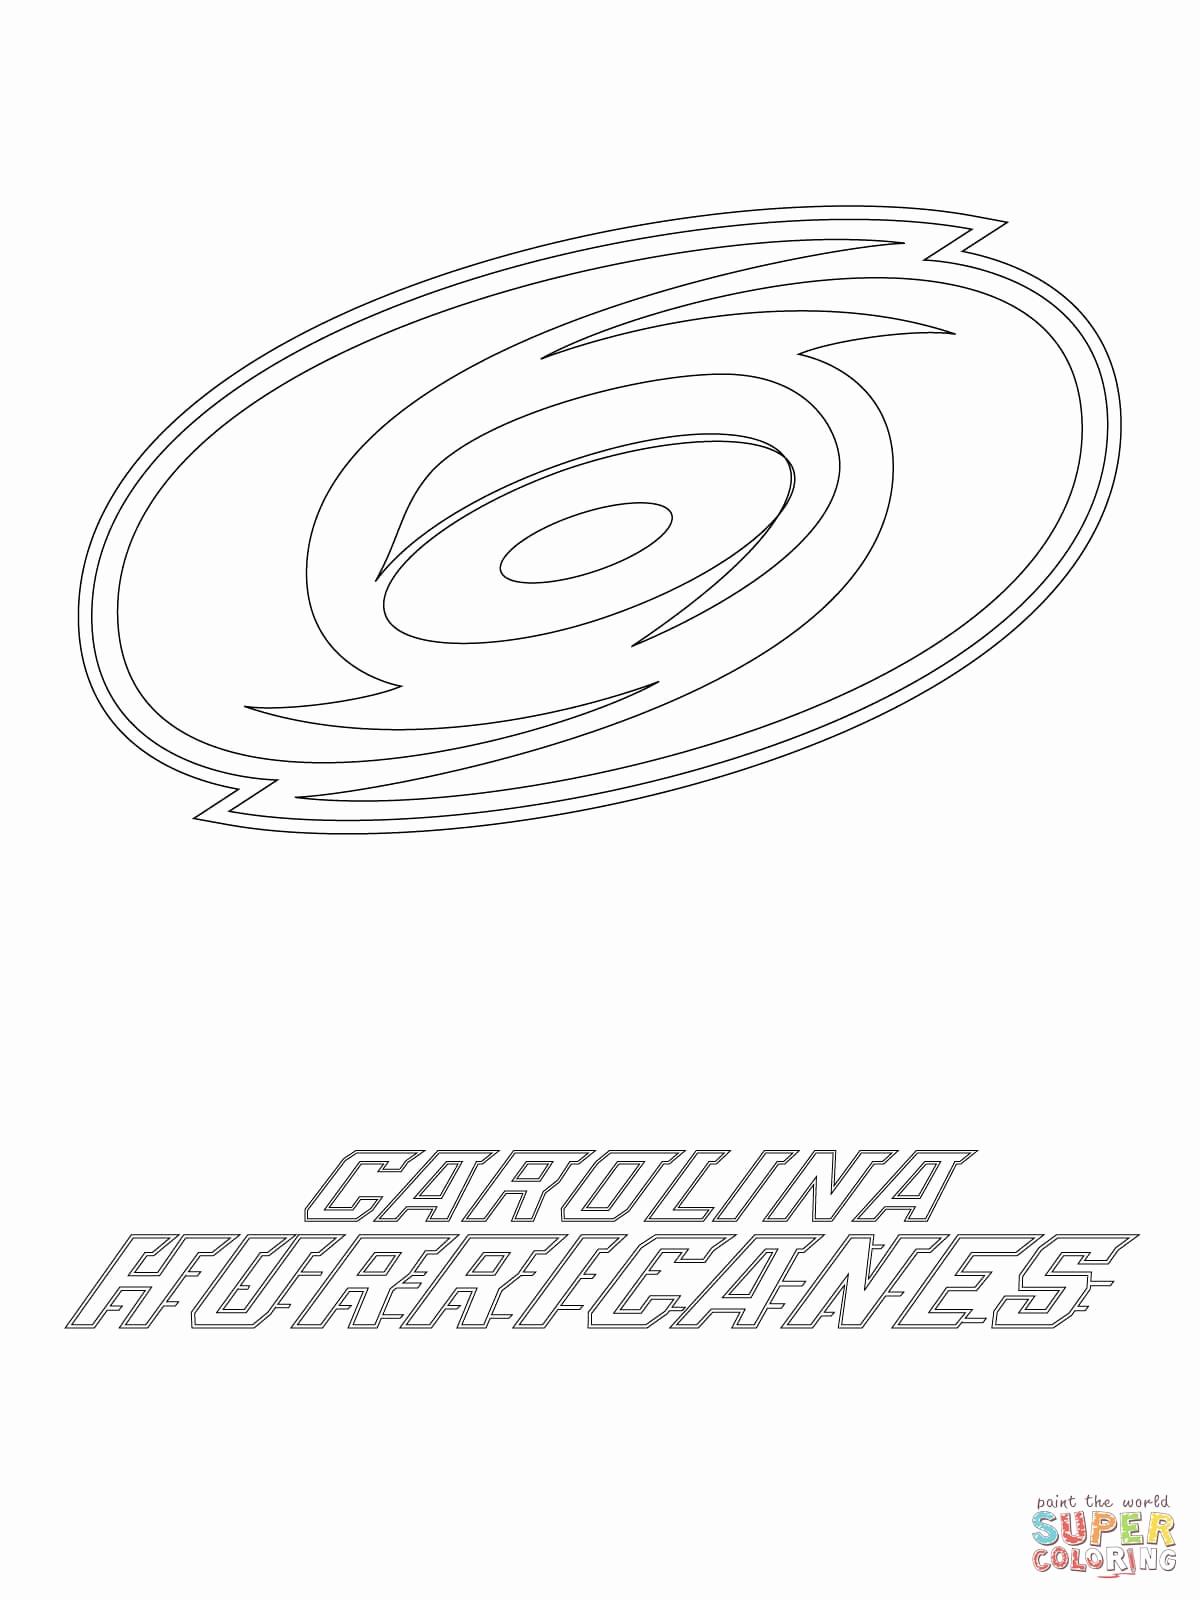 Carolina Panthers Logo Coloring Pages at GetDrawings.com ...